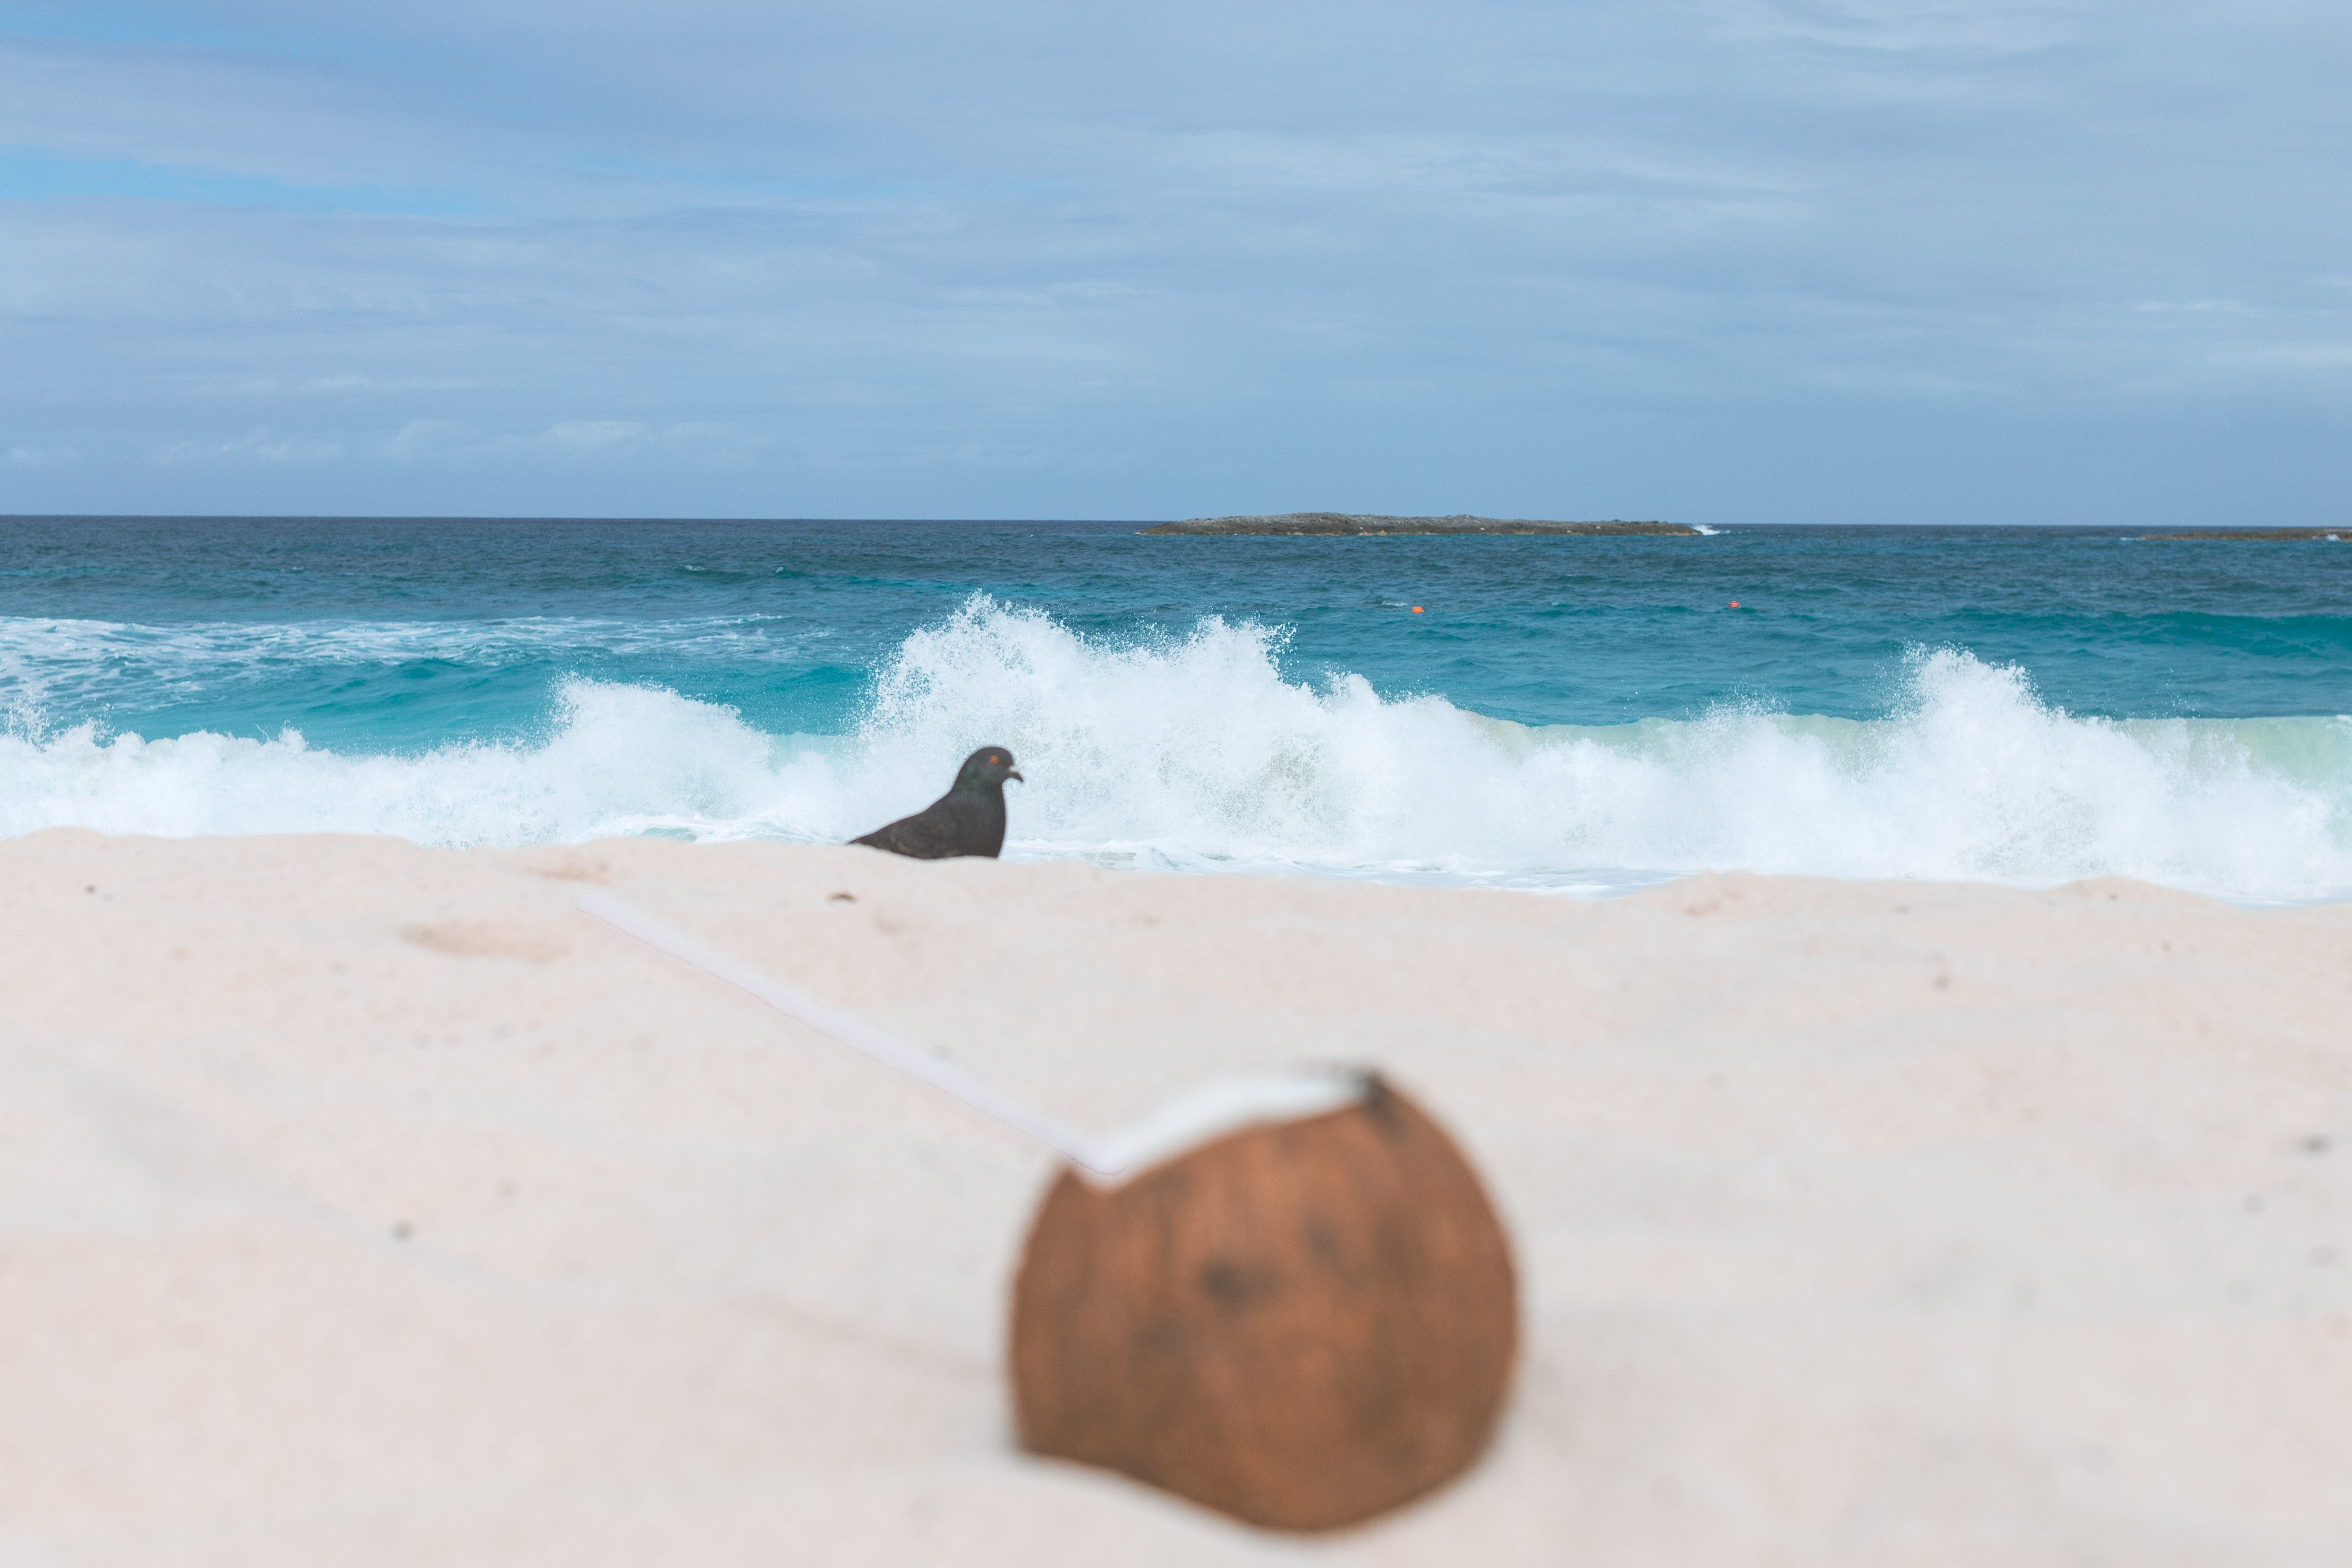 Free stock photo of alcoholic beverage, Bahamas, beach, beach bum